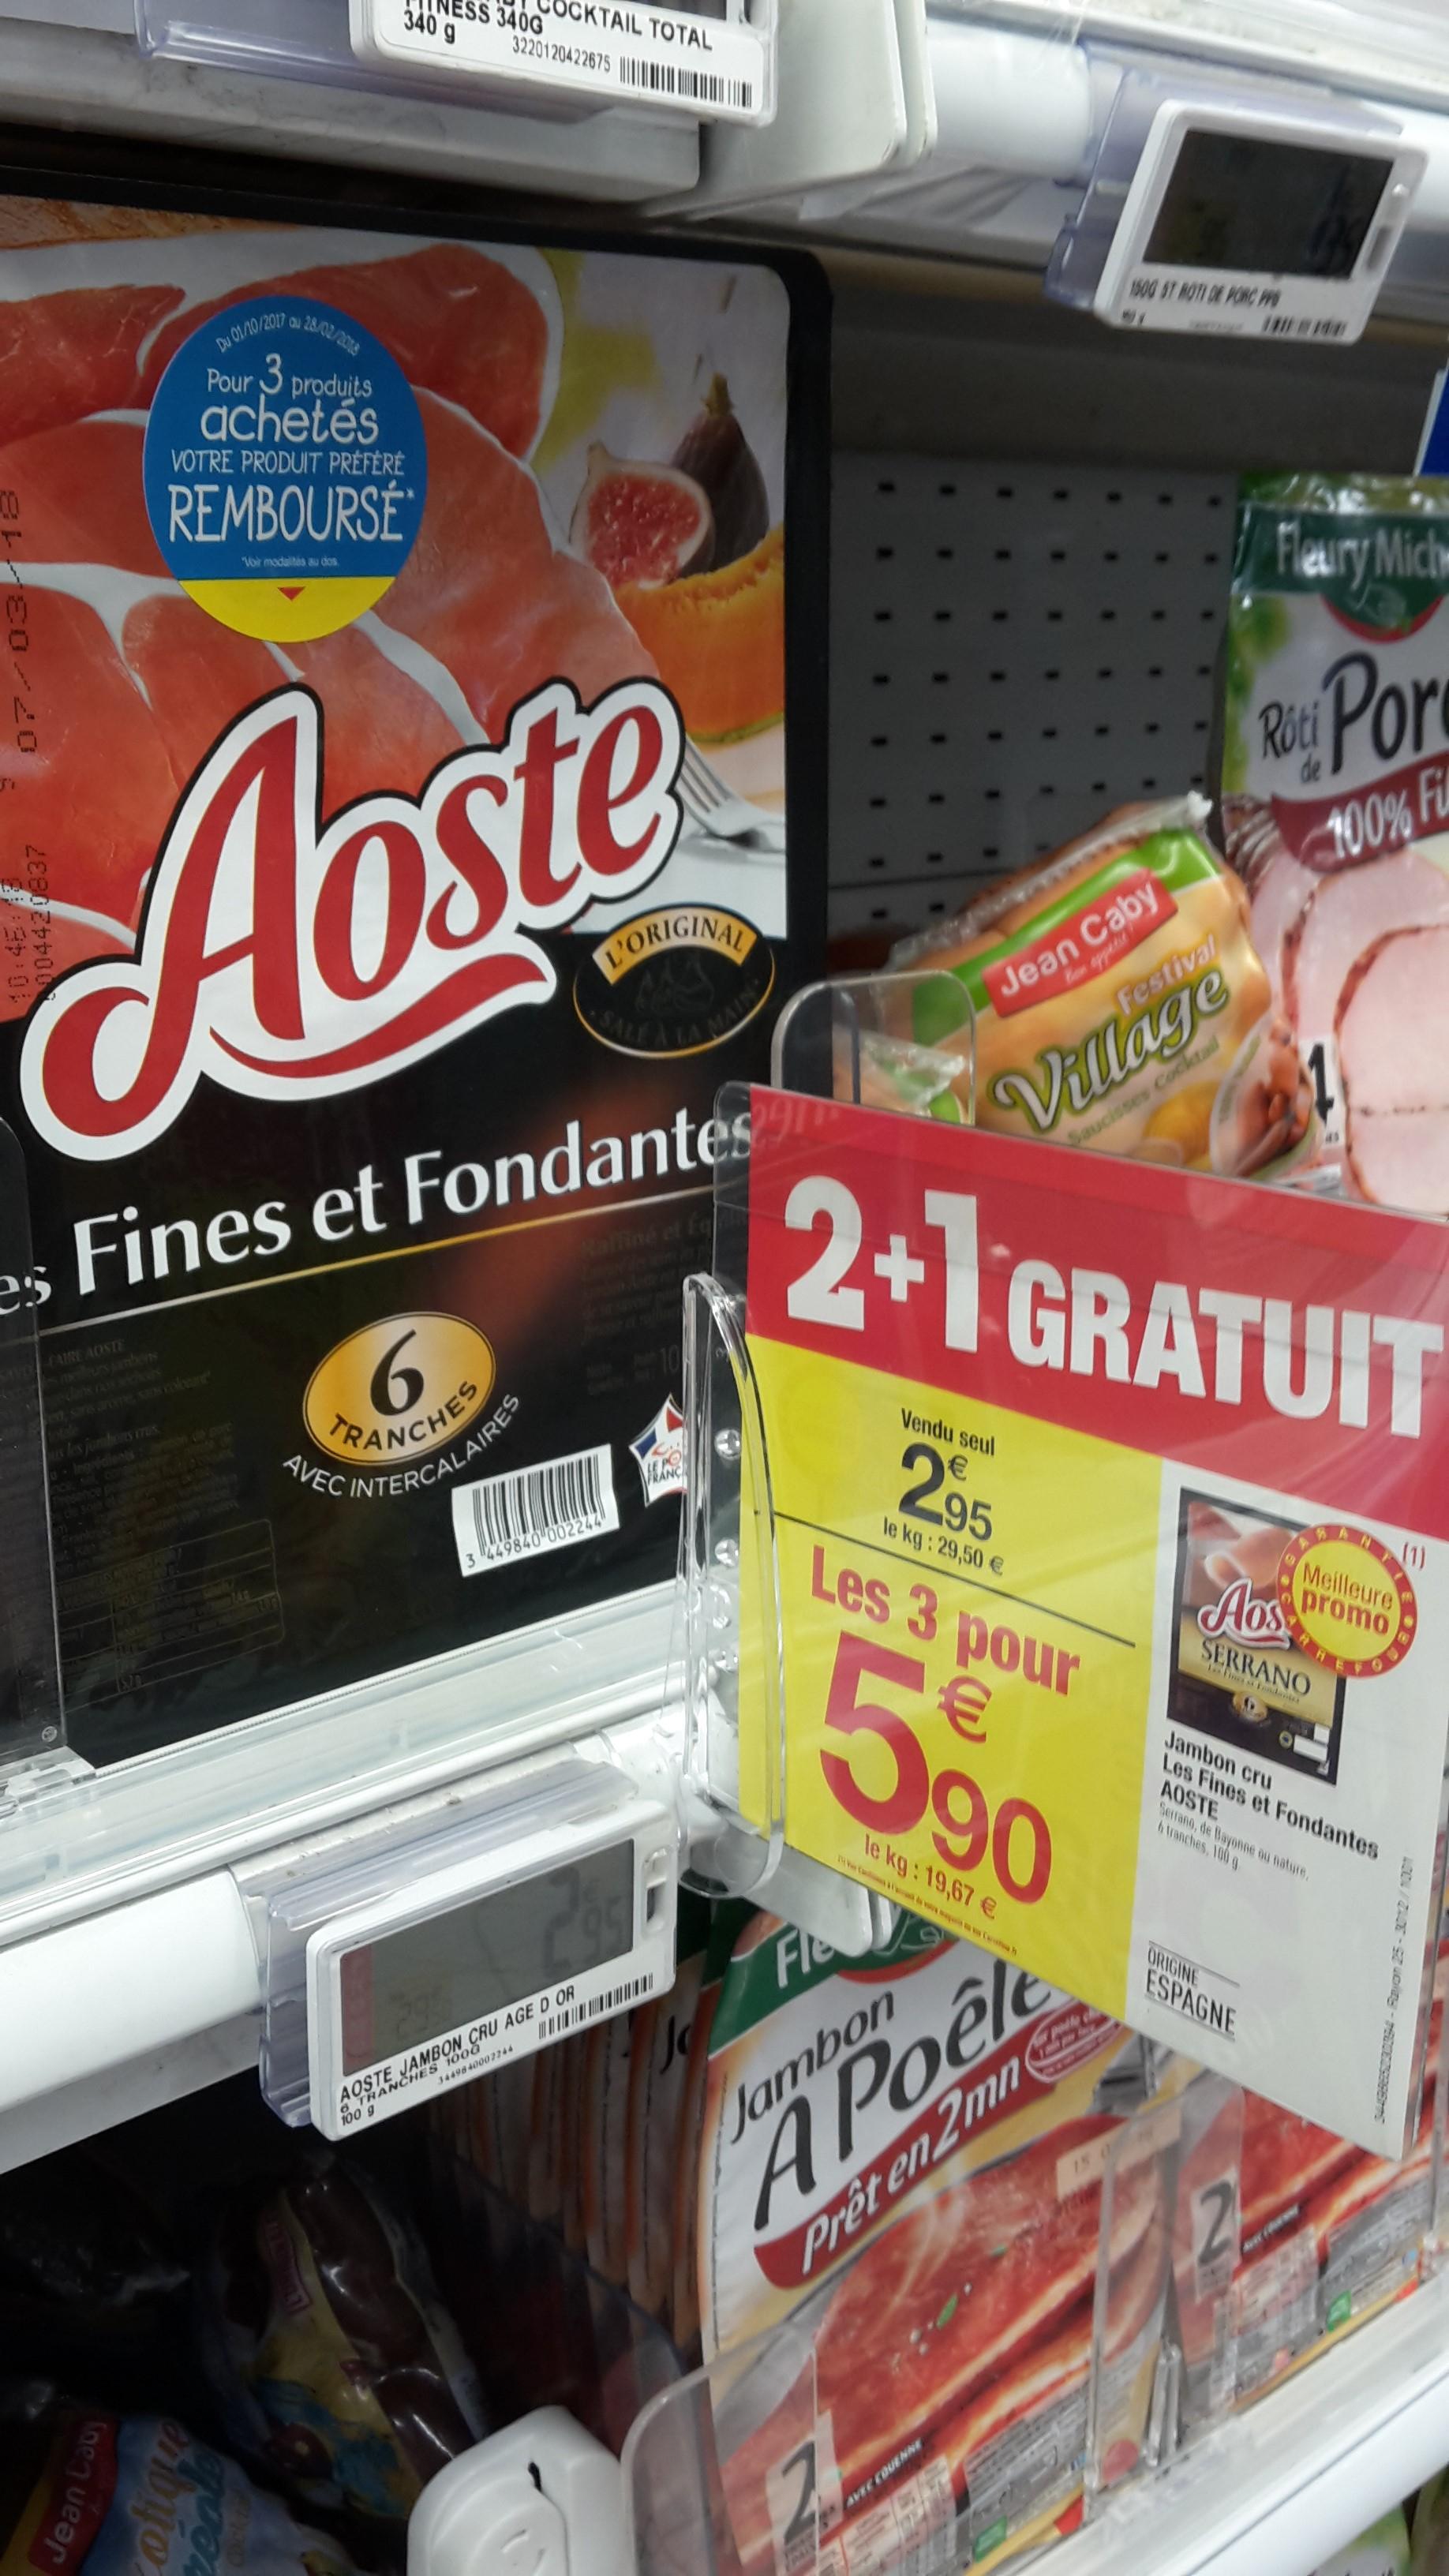 3 Paquets de 6 tranches de Jambon Aoste (via ODR de 2.95€)